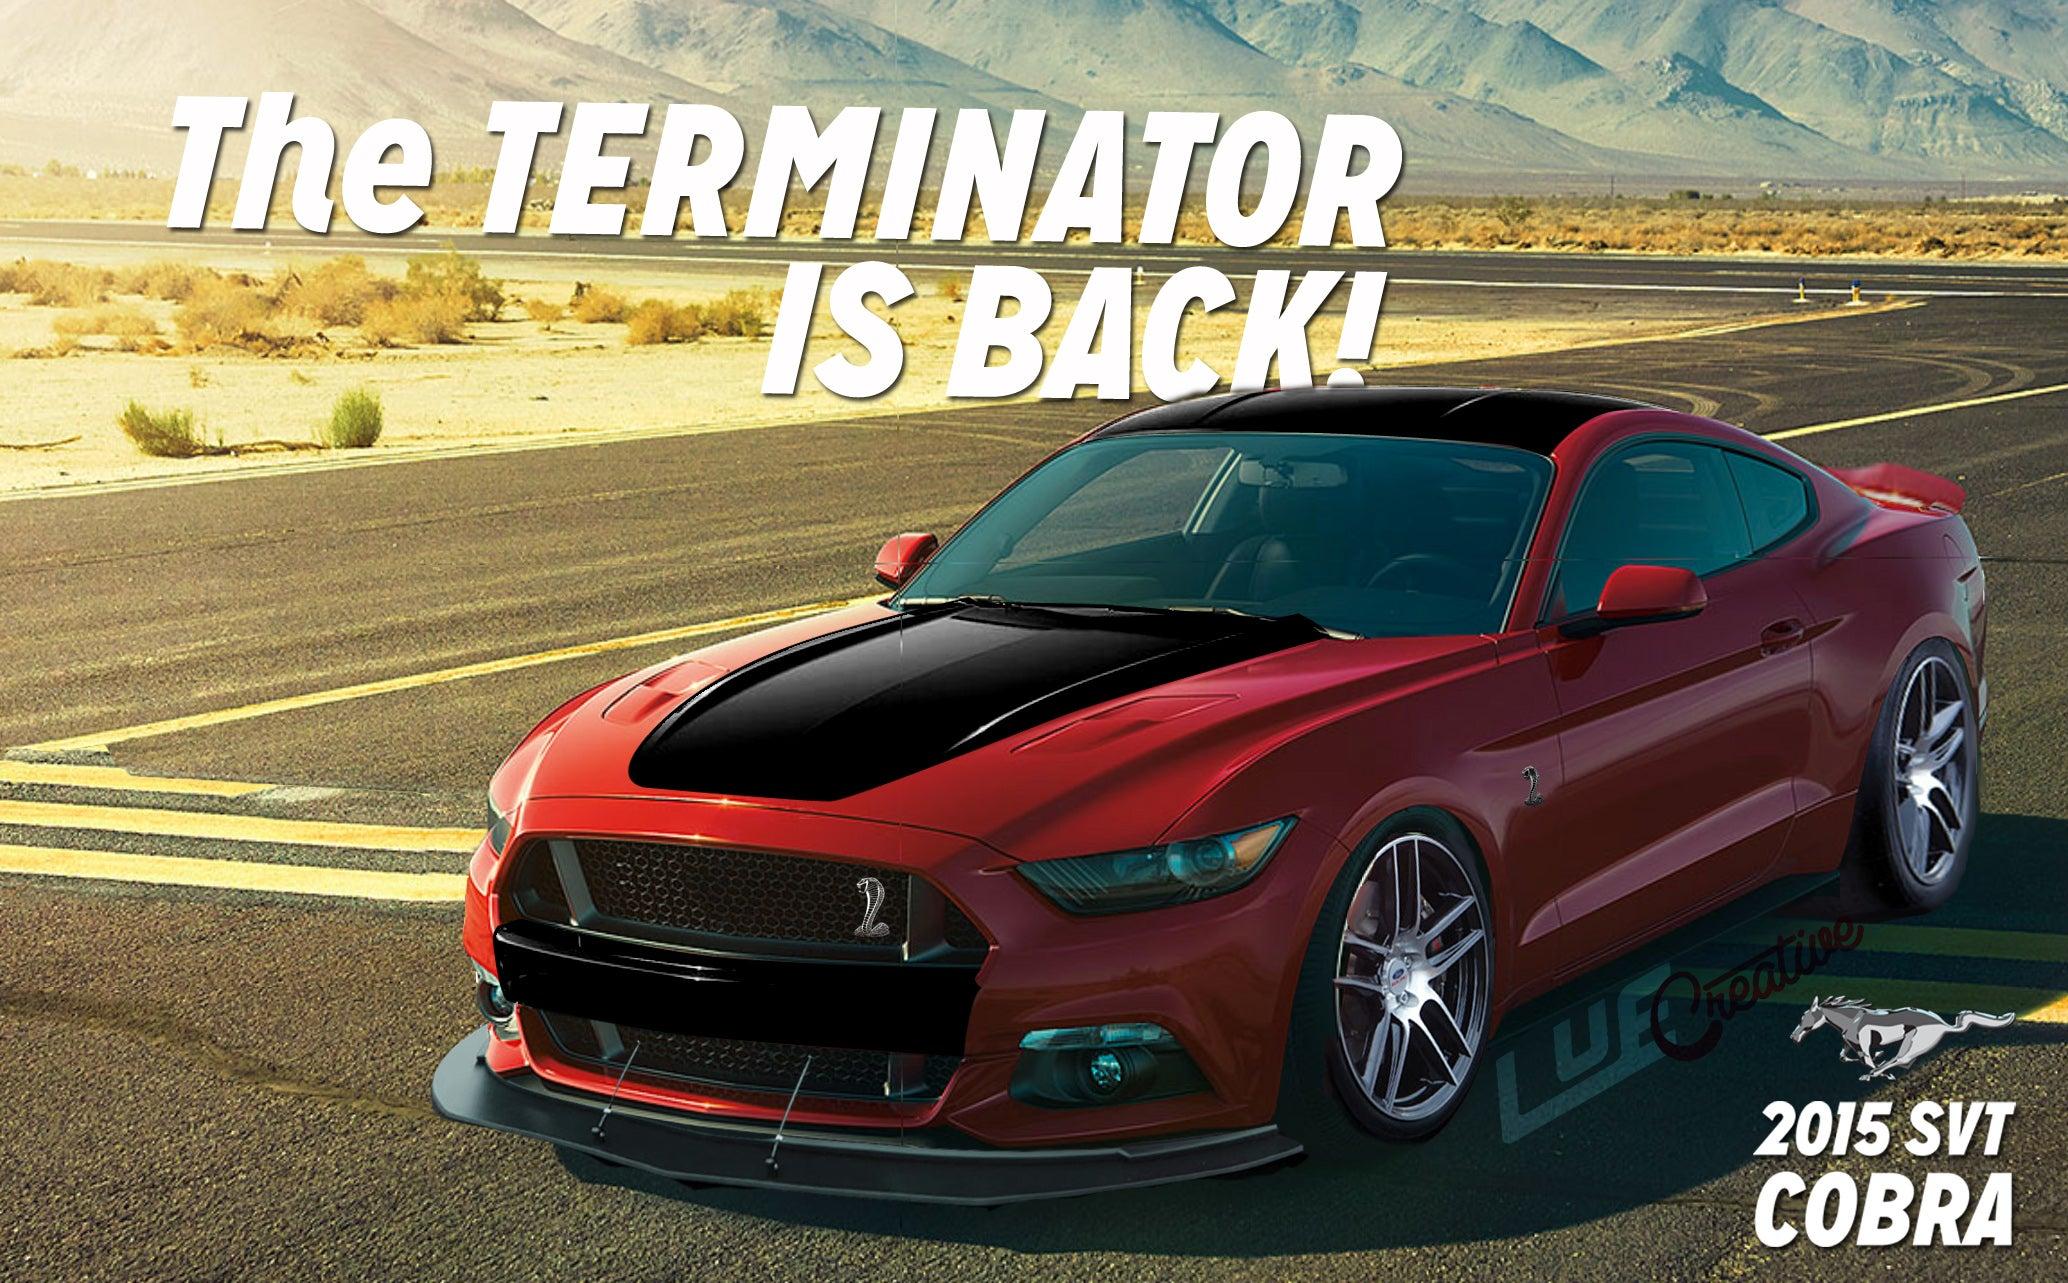 Image Gallery 2014 mustang terminator